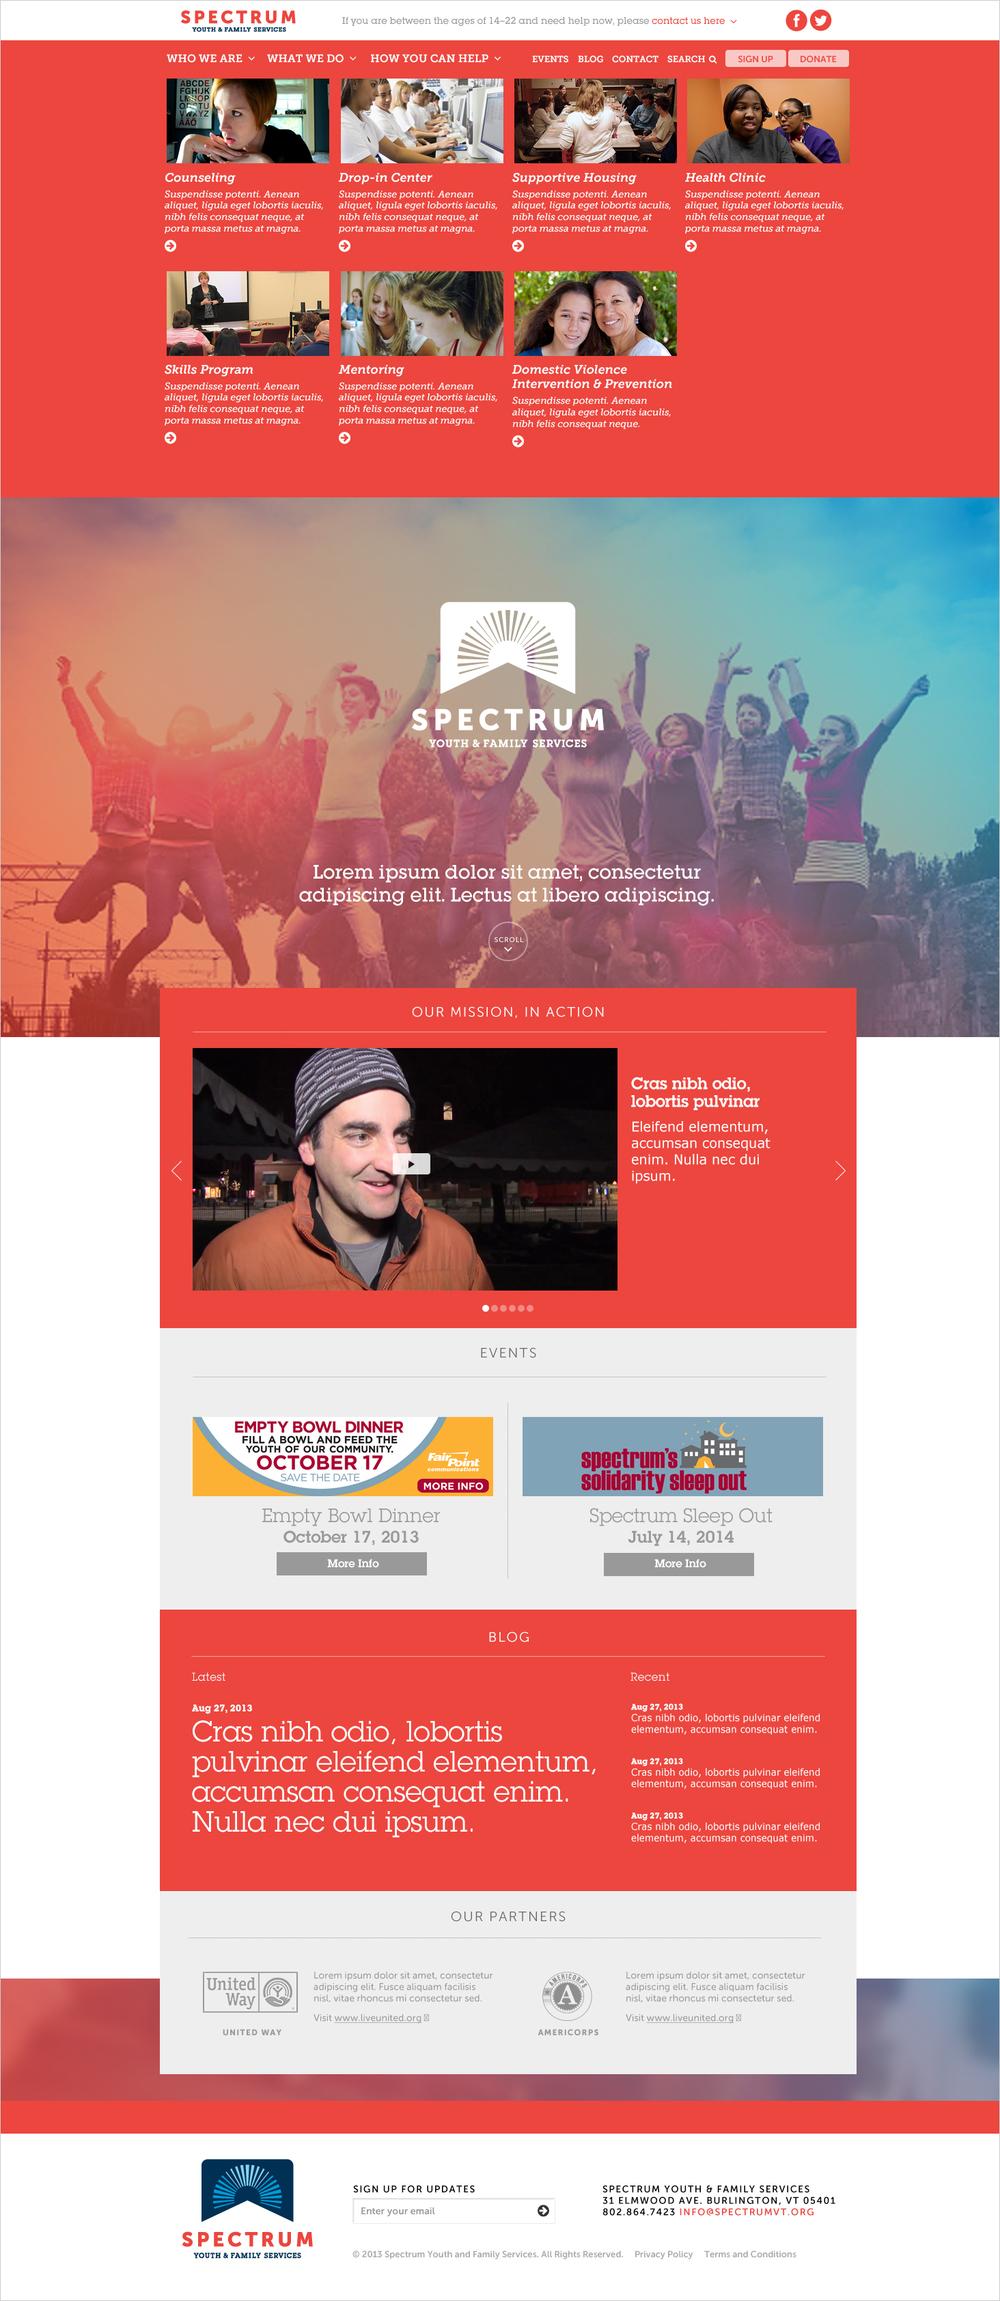 spectrum_web_concept1.jpg